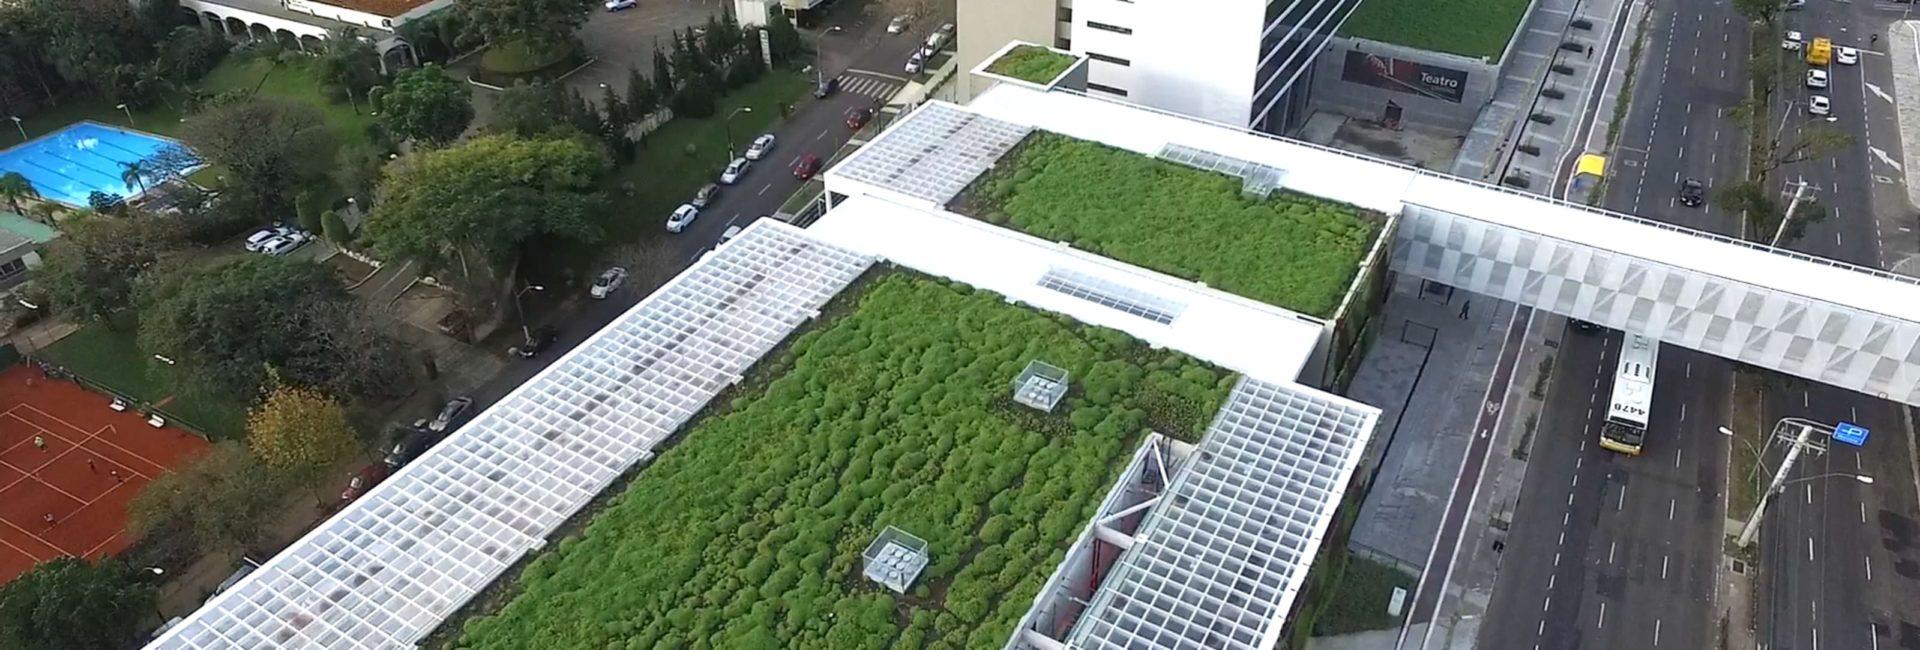 telhado-verde-ecologico-teto-verde-unisinos